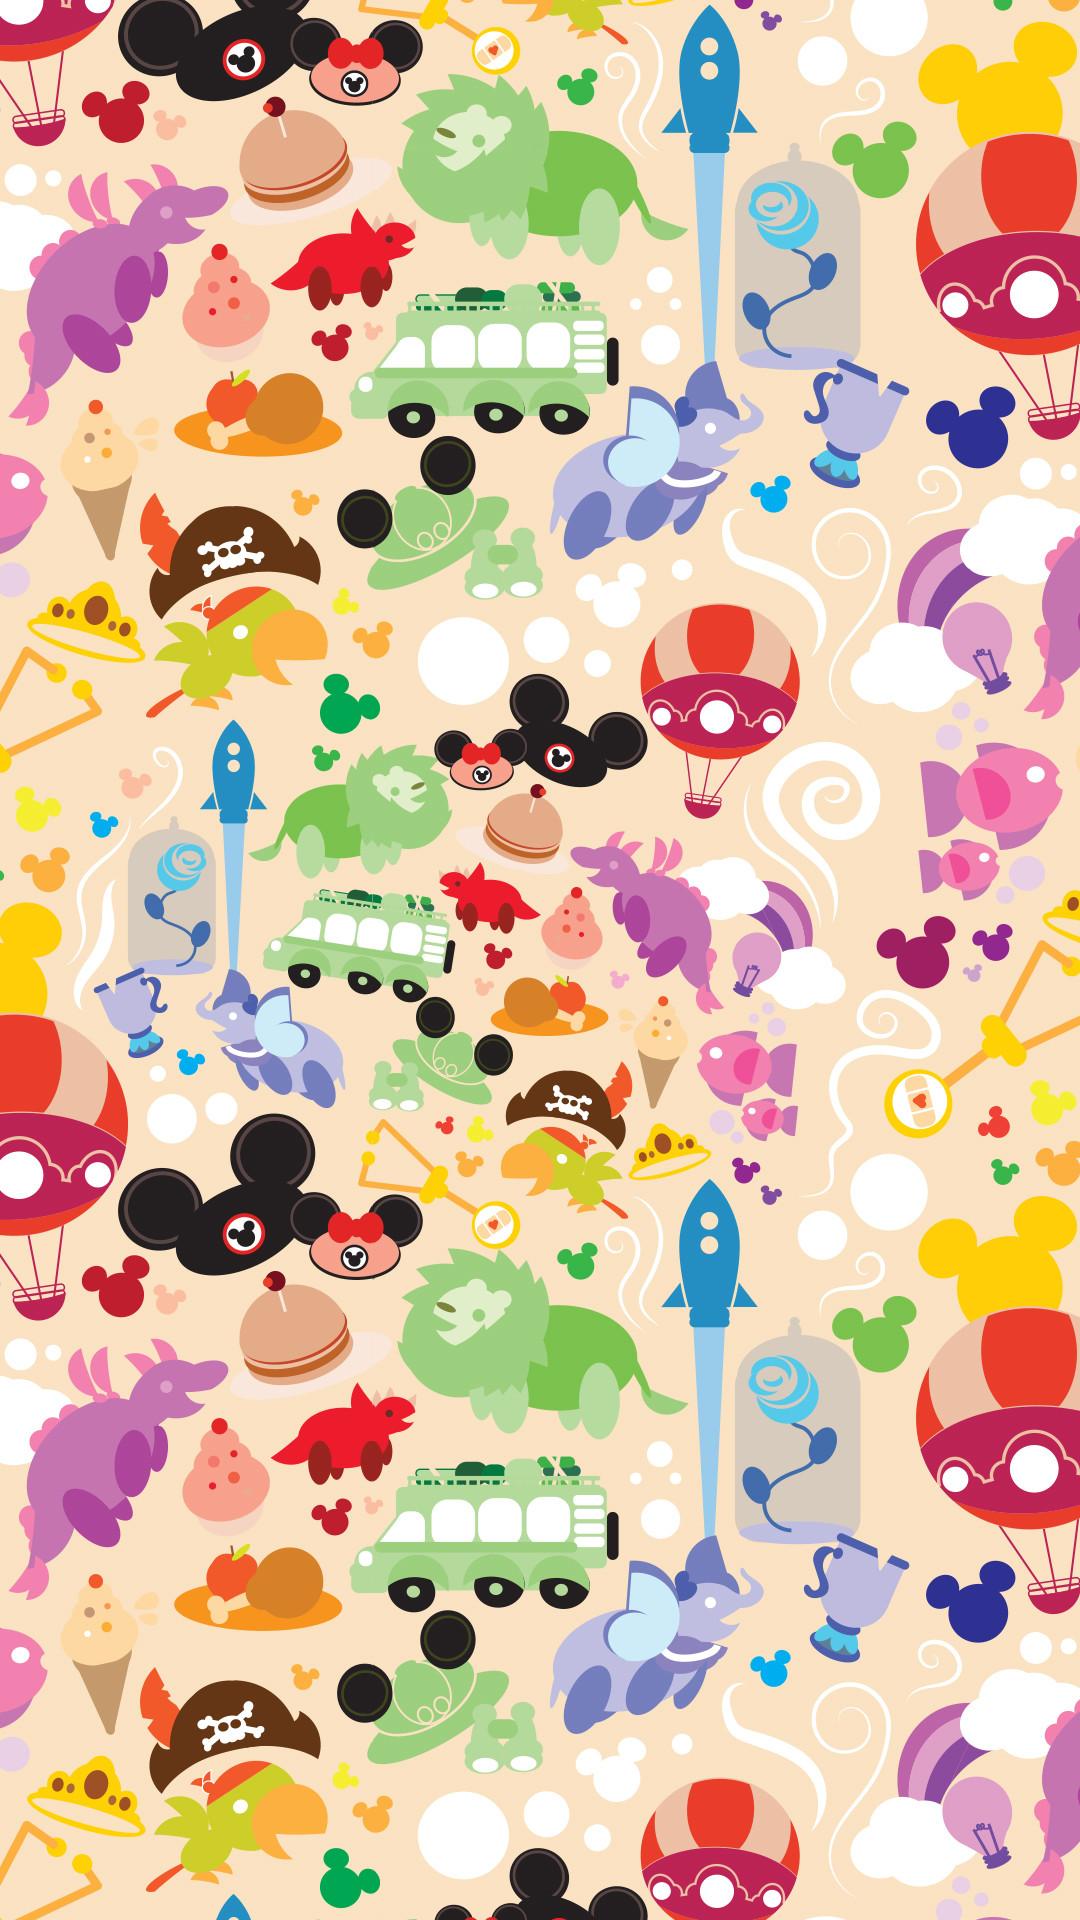 High resolution wallpaper background ID 77700266476